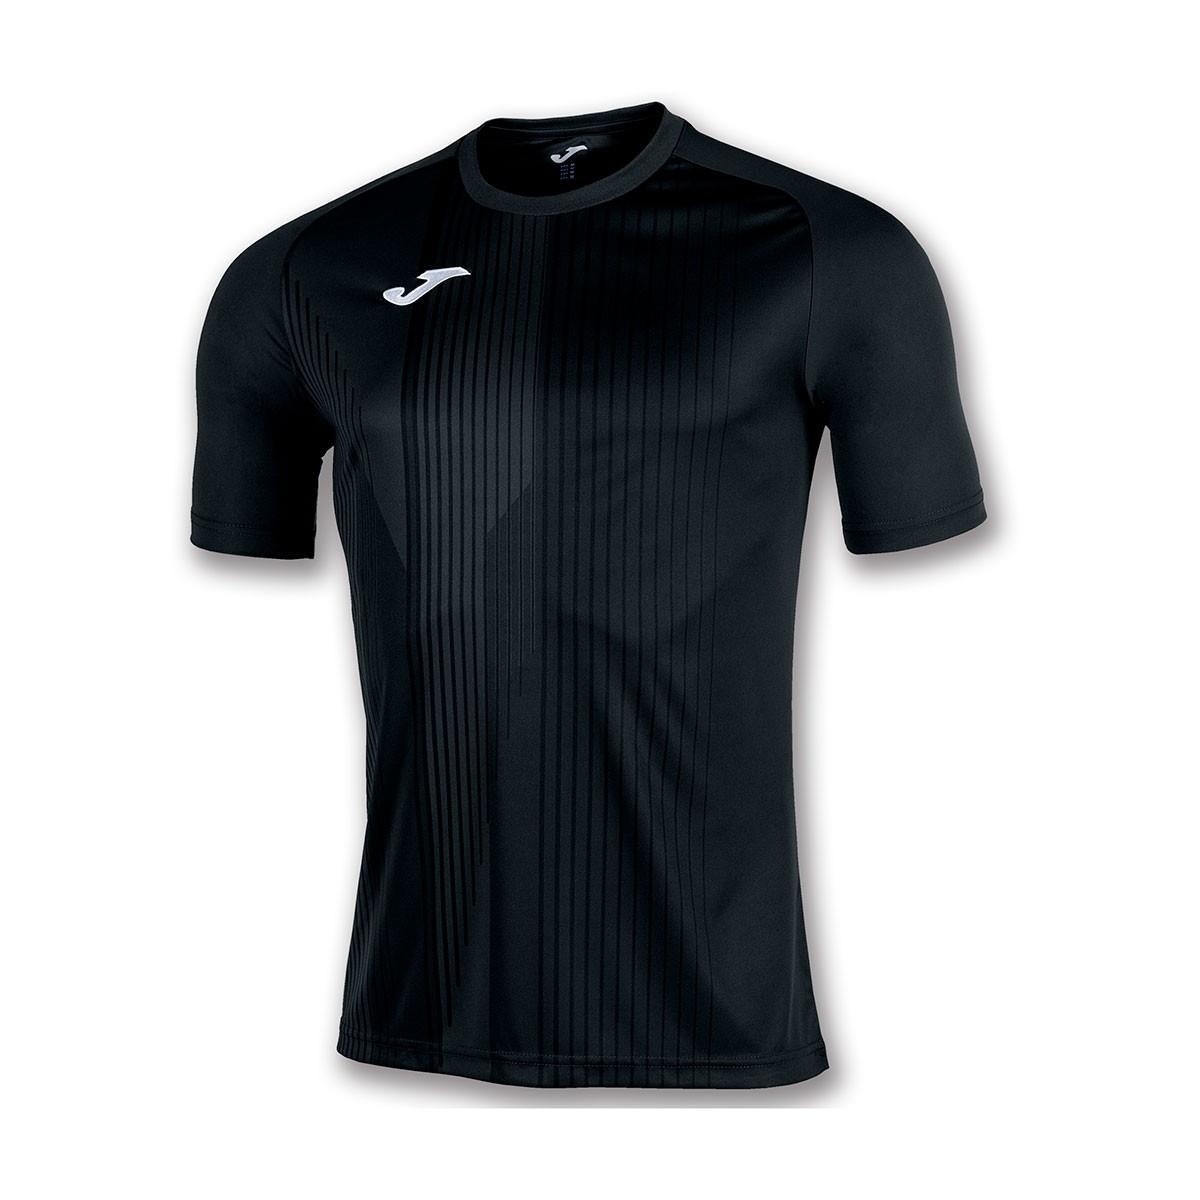 5faf0ea5934 Jersey Joma Tiger m/c Black - Football store Fútbol Emotion